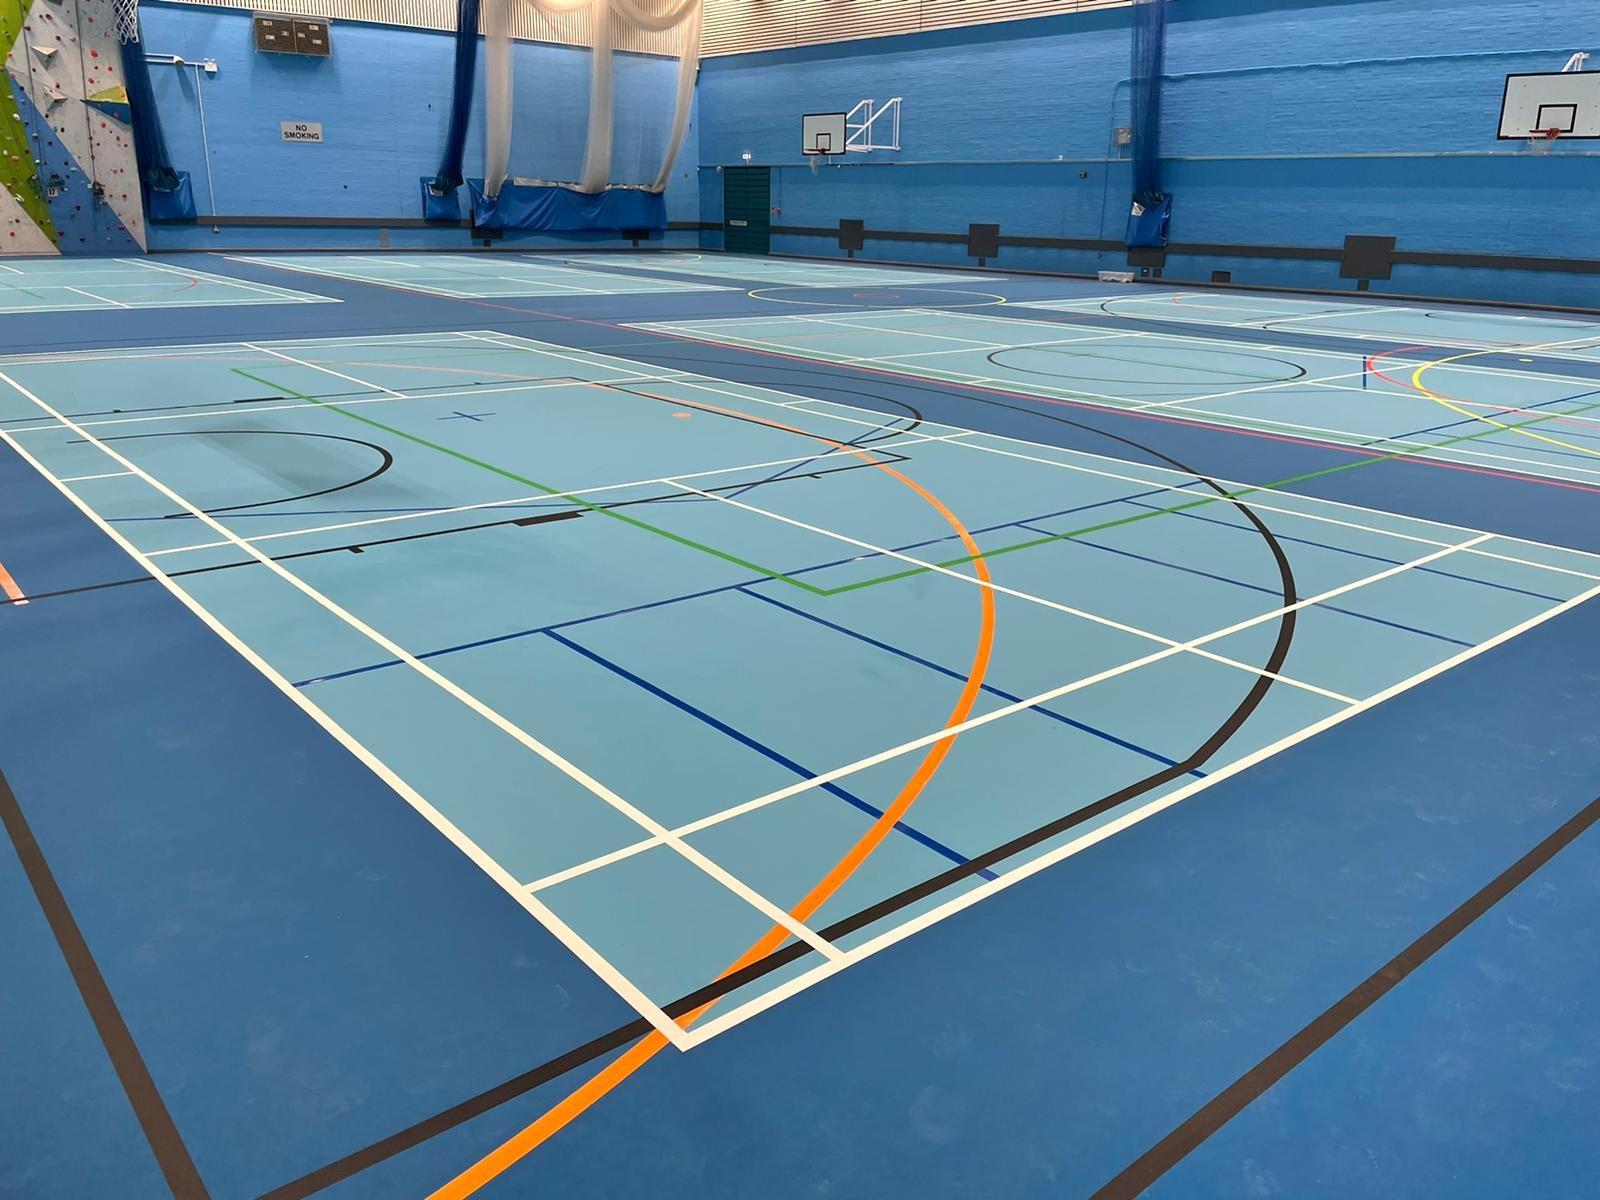 Pulastic facelift indoor polyurethane sports flooring